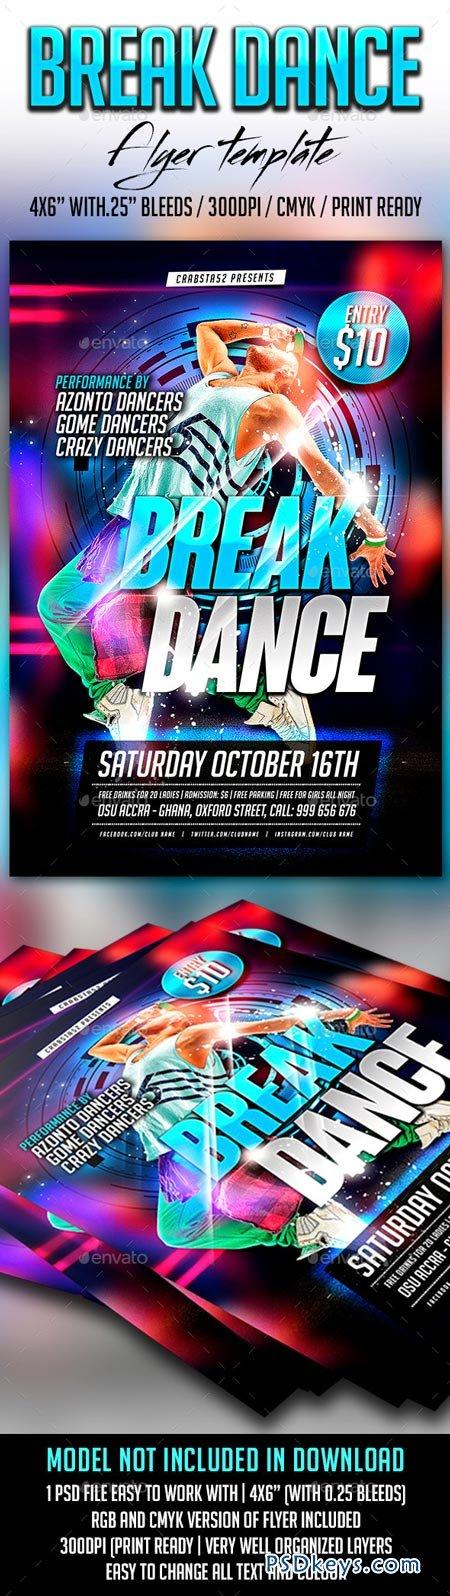 Break Dance Flyer Template 8941633